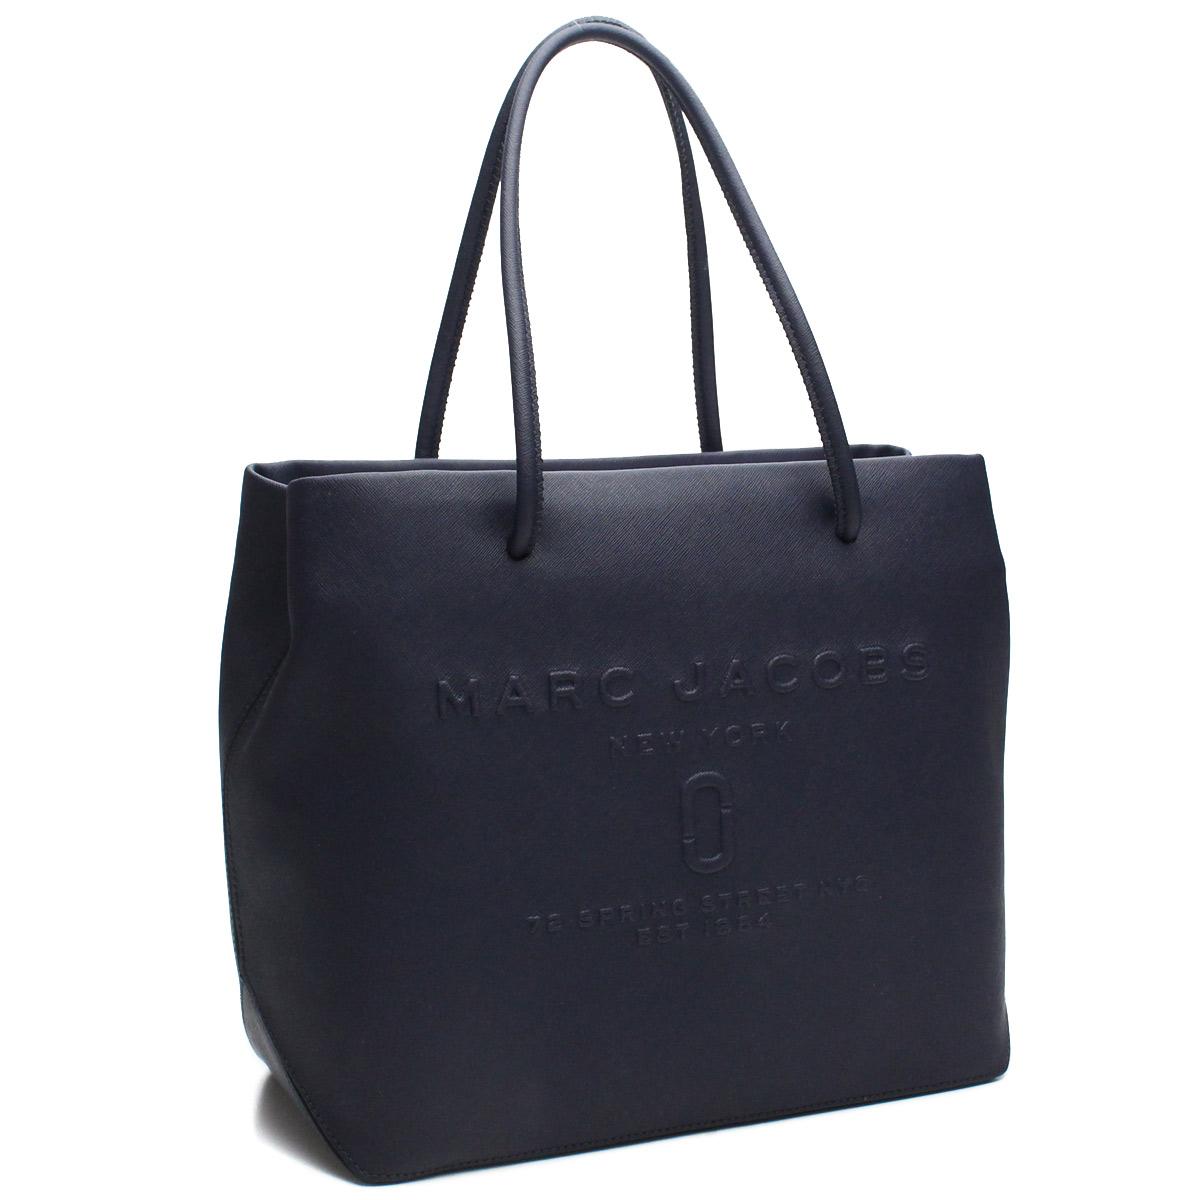 b99bb9713b50 Bighit The total brand wholesale  Mark Jacobs MARC JACOBS bag LOGO SHOPPER  logo shopper tote bag M0011046 415 MIDNIGHT BLUE navy system